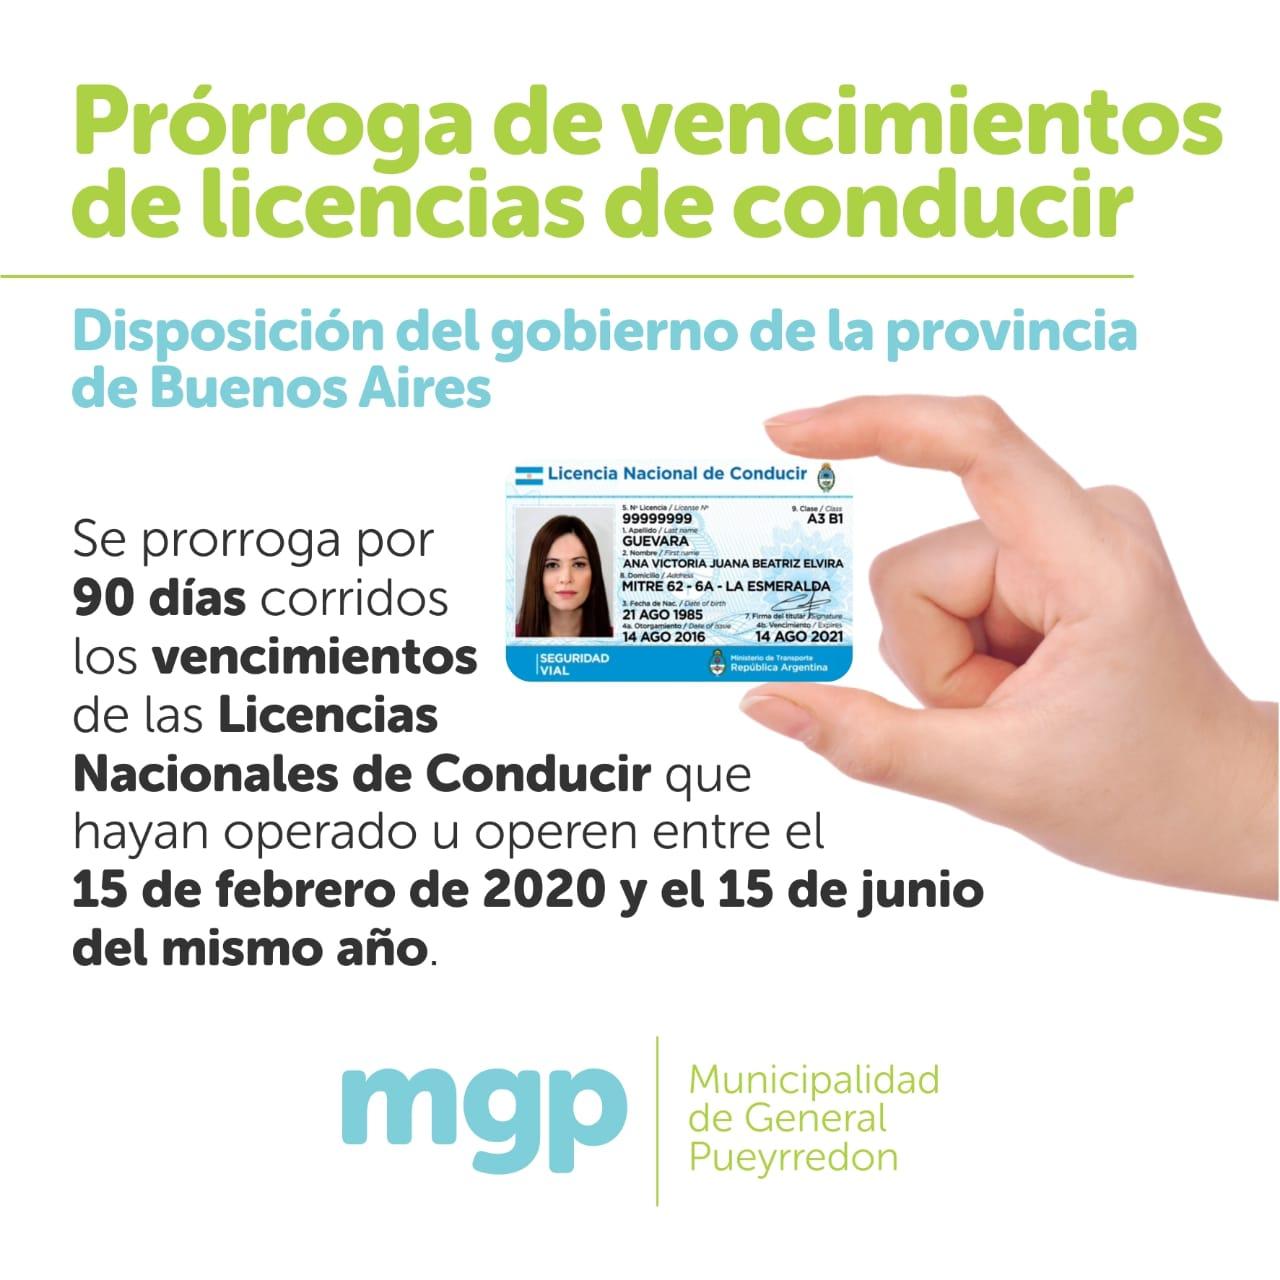 prorroga licencia de conducir